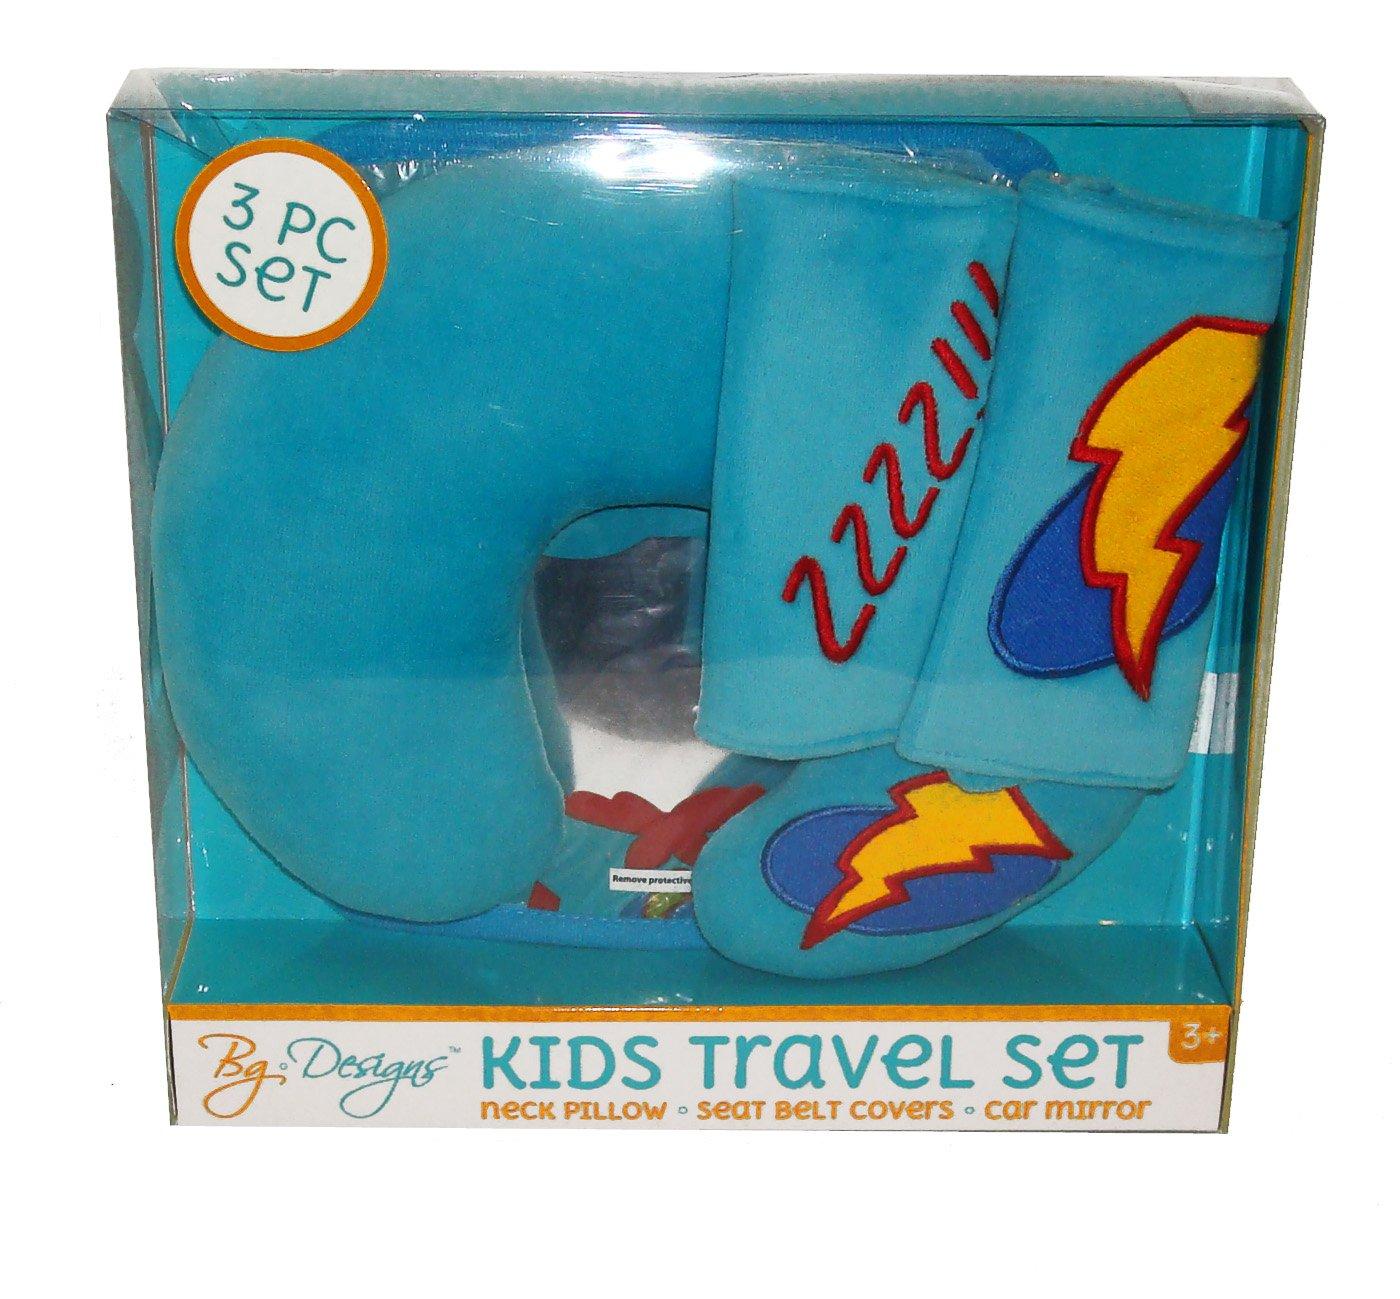 Super Hero Kids Travel Set for Car Seat or Stroller Neck Rest Pillow, Seat Belt Covers , Car Mirror BG Designs